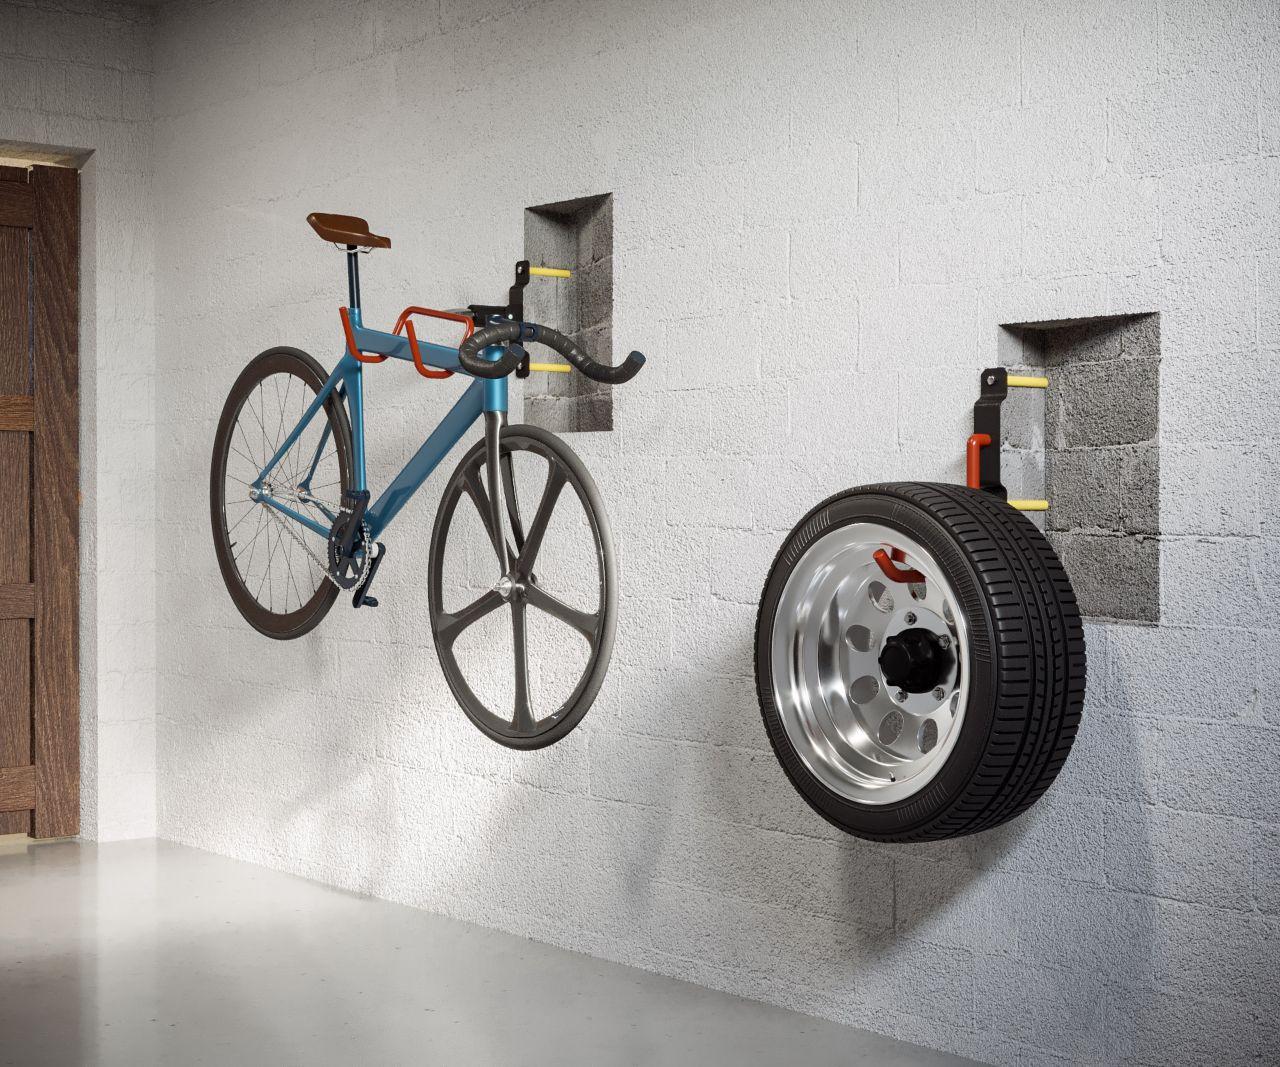 Make it pro garage anchor